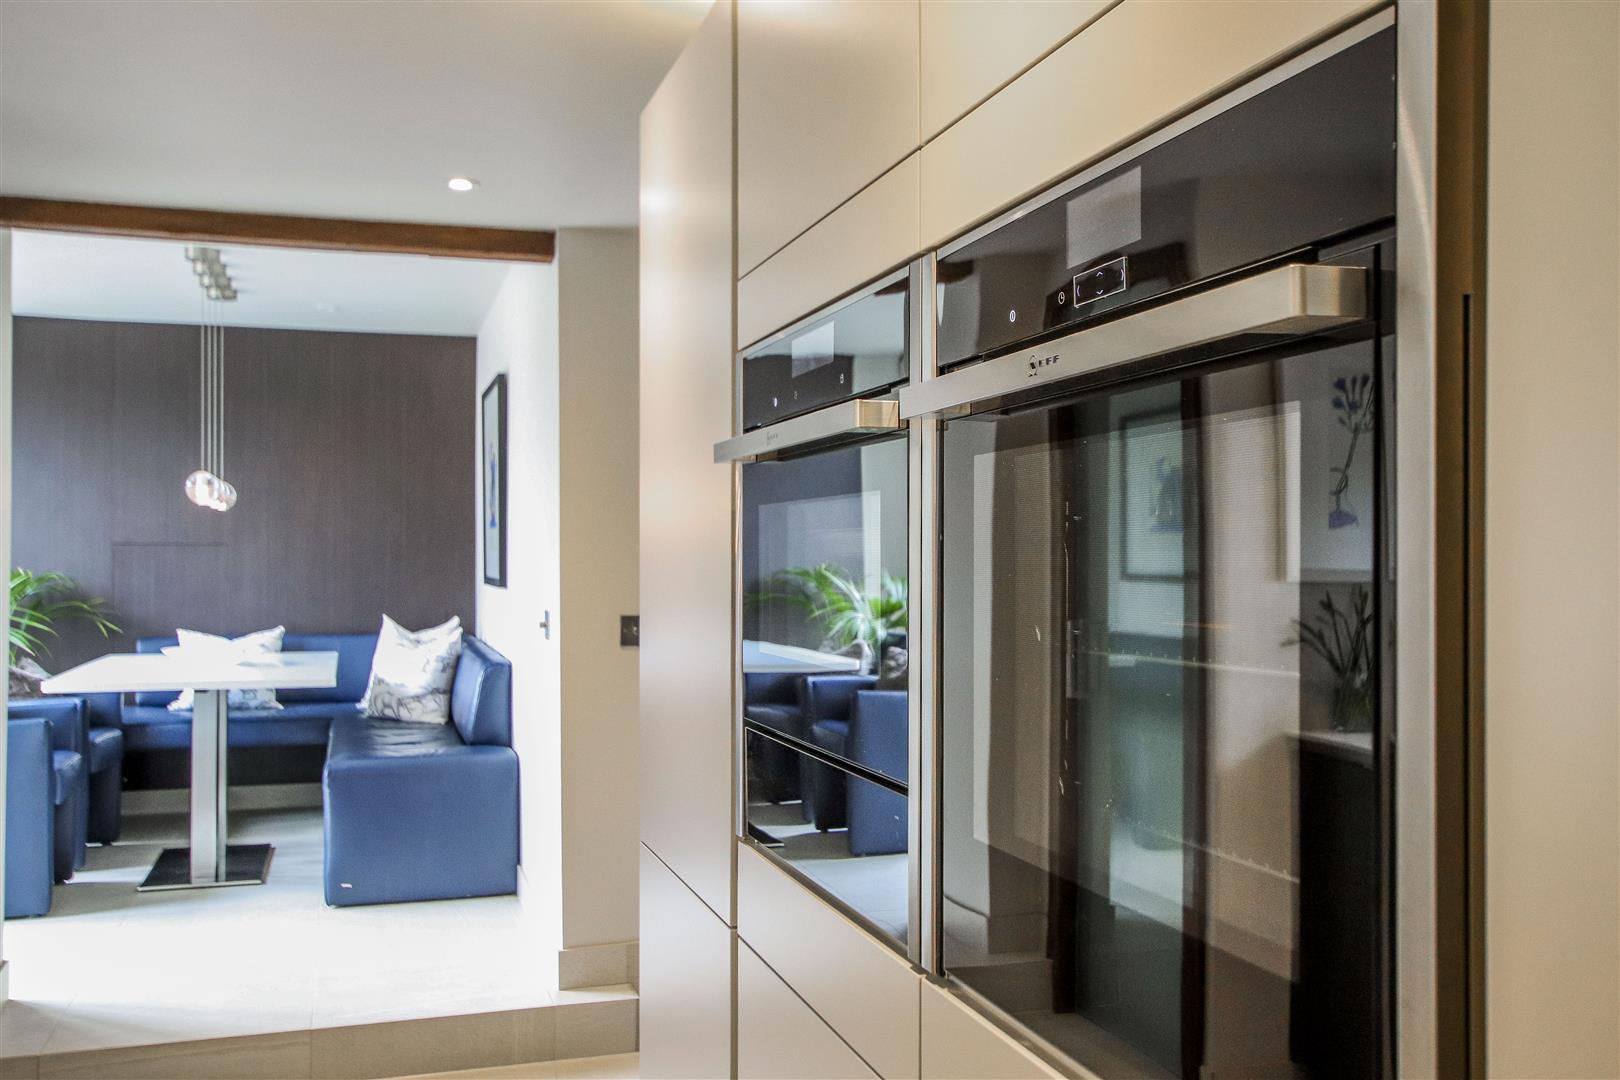 5 Bedroom Semi-detached House For Sale - 48.JPG